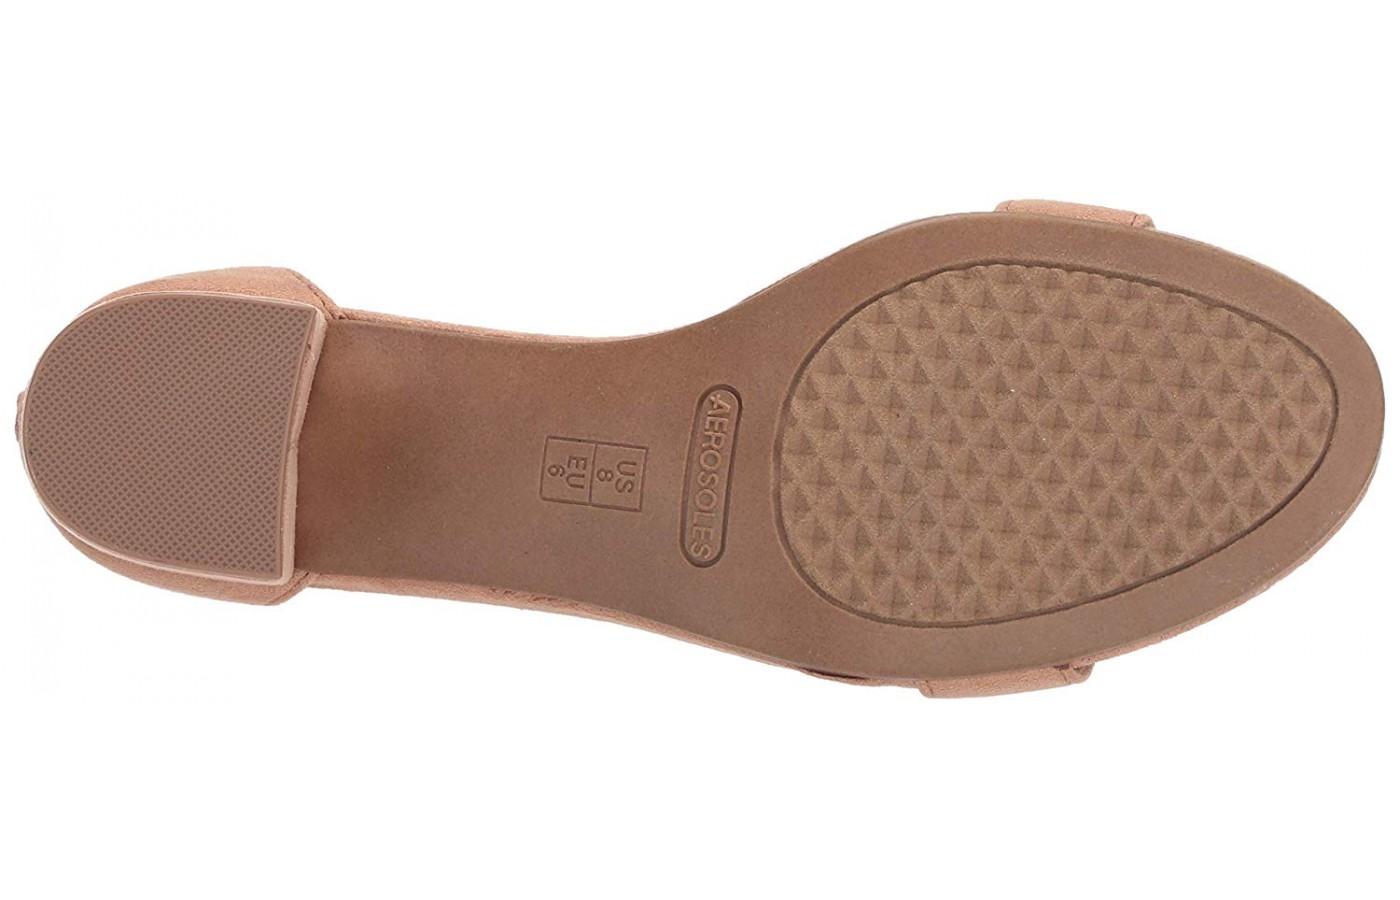 Aerosoles Martha Stewart Mid Year diamond pattern sole